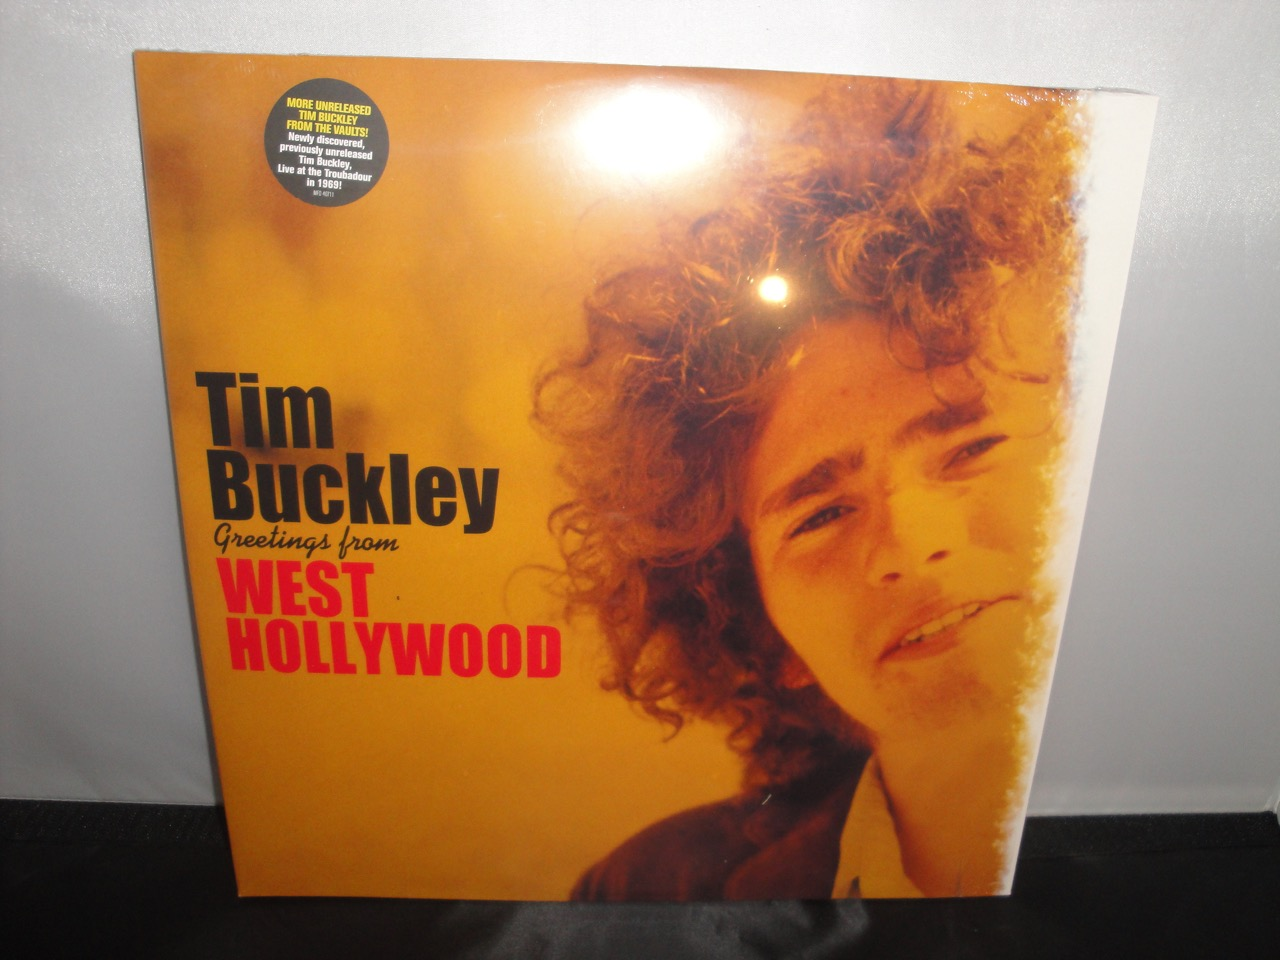 Tim Buckley - Greetings From West Hollywood - Live 1969, Vinyl, LP, 2017